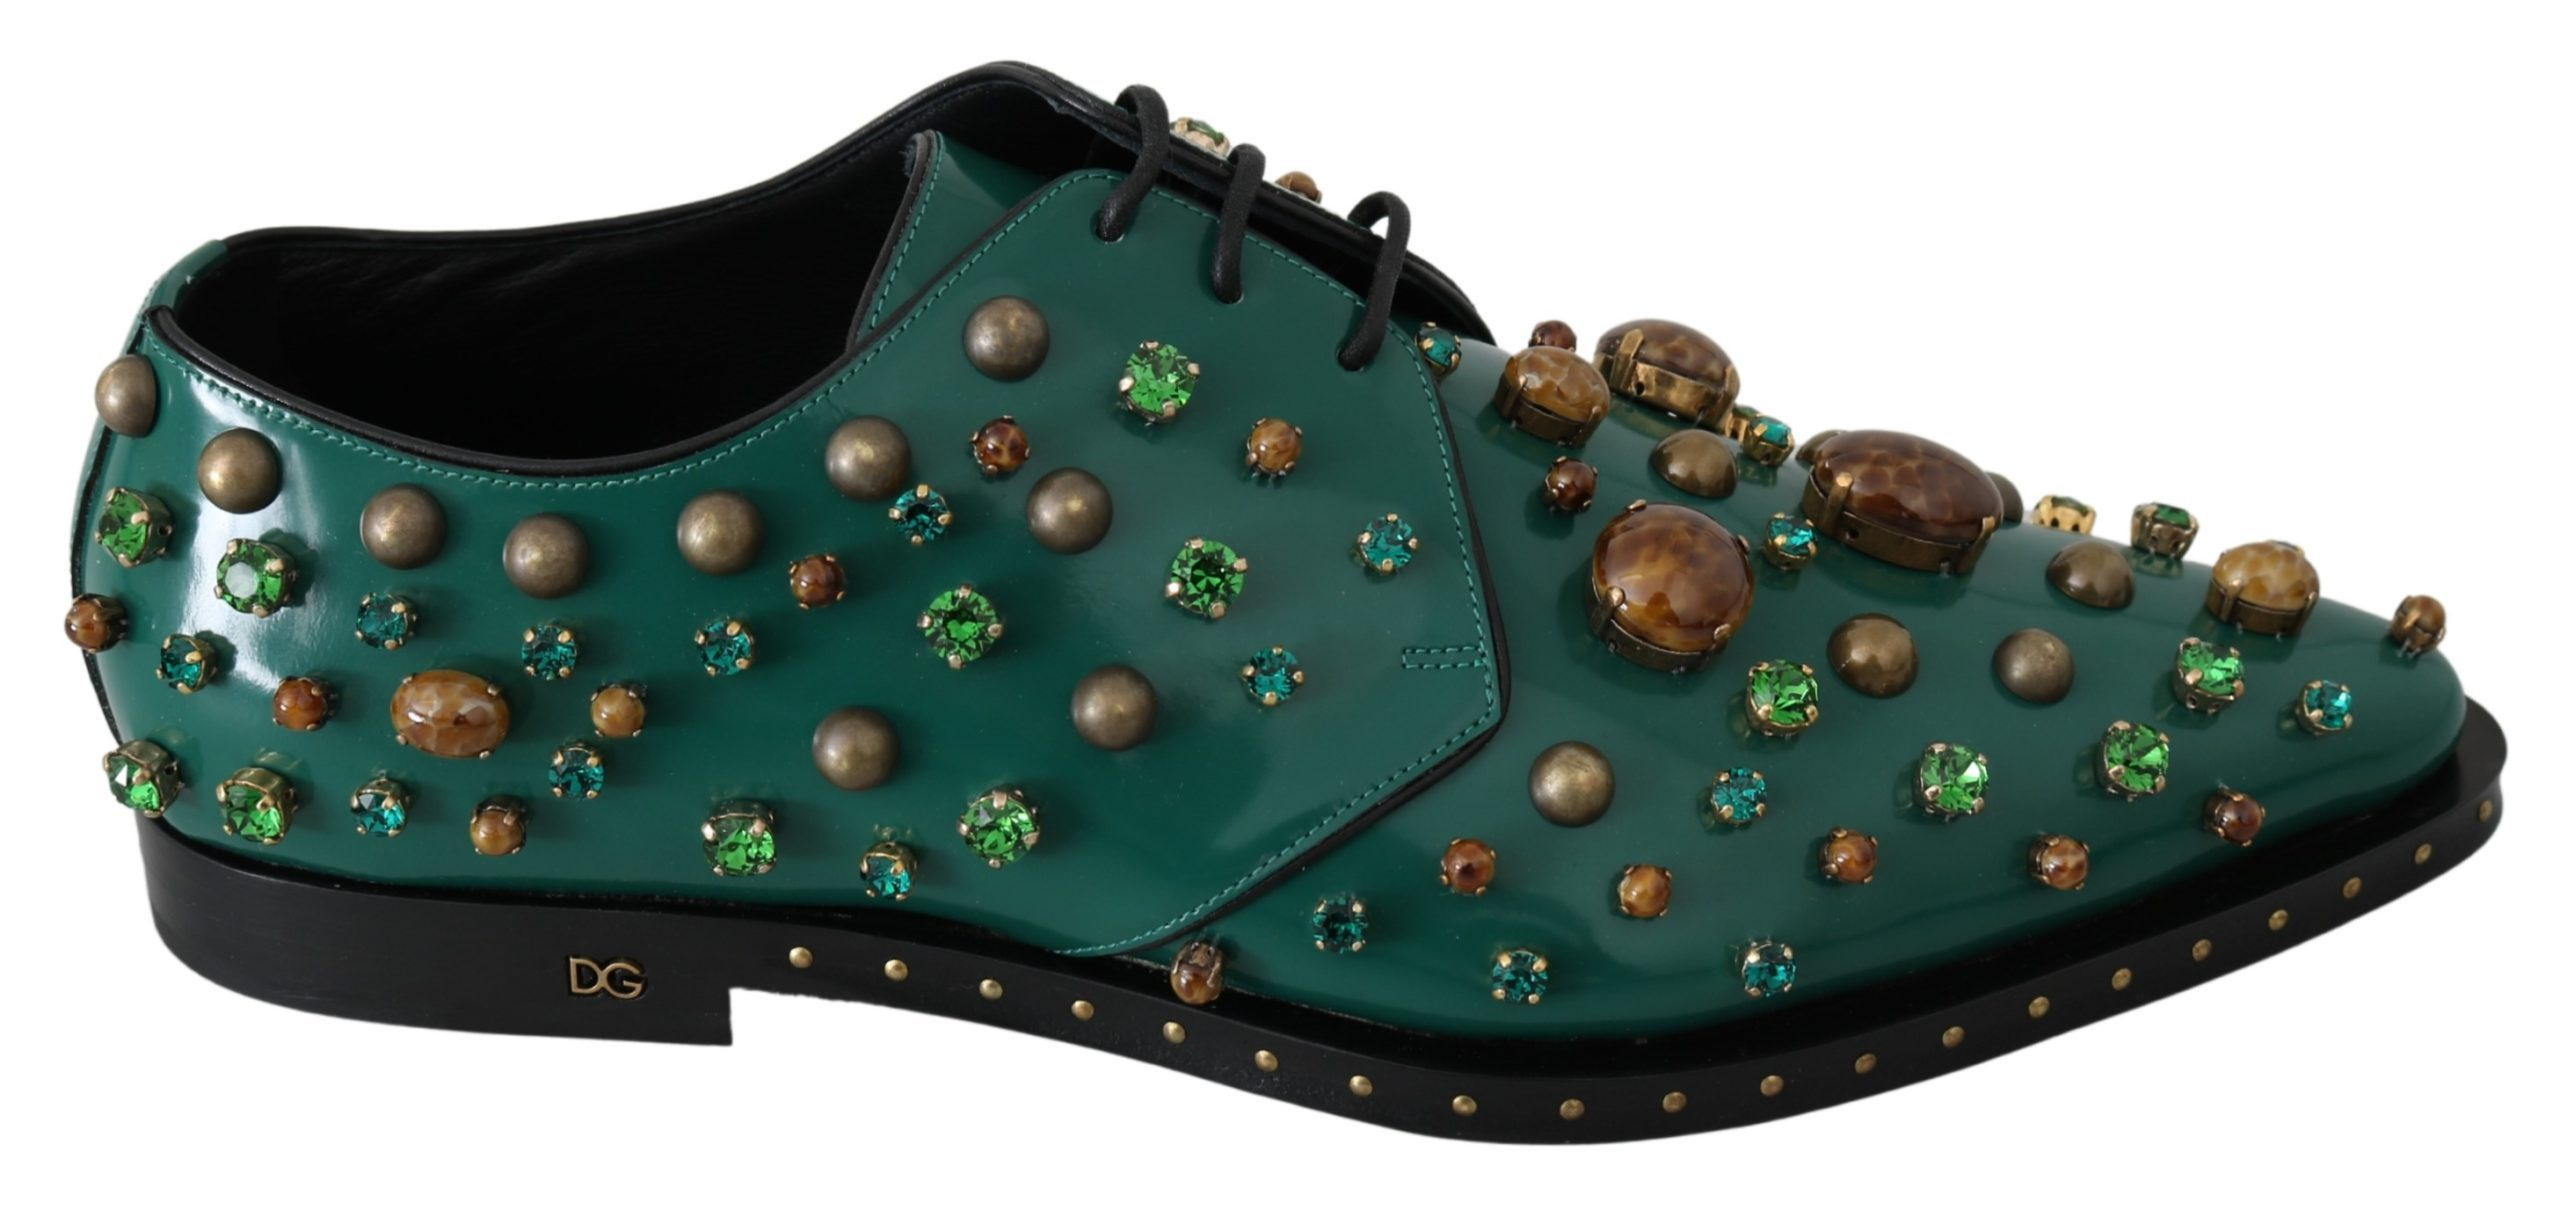 Dolce & Gabbana Women's Leather Crystal Dress Broque Shoe Green LA7212 - EU41/US10.5